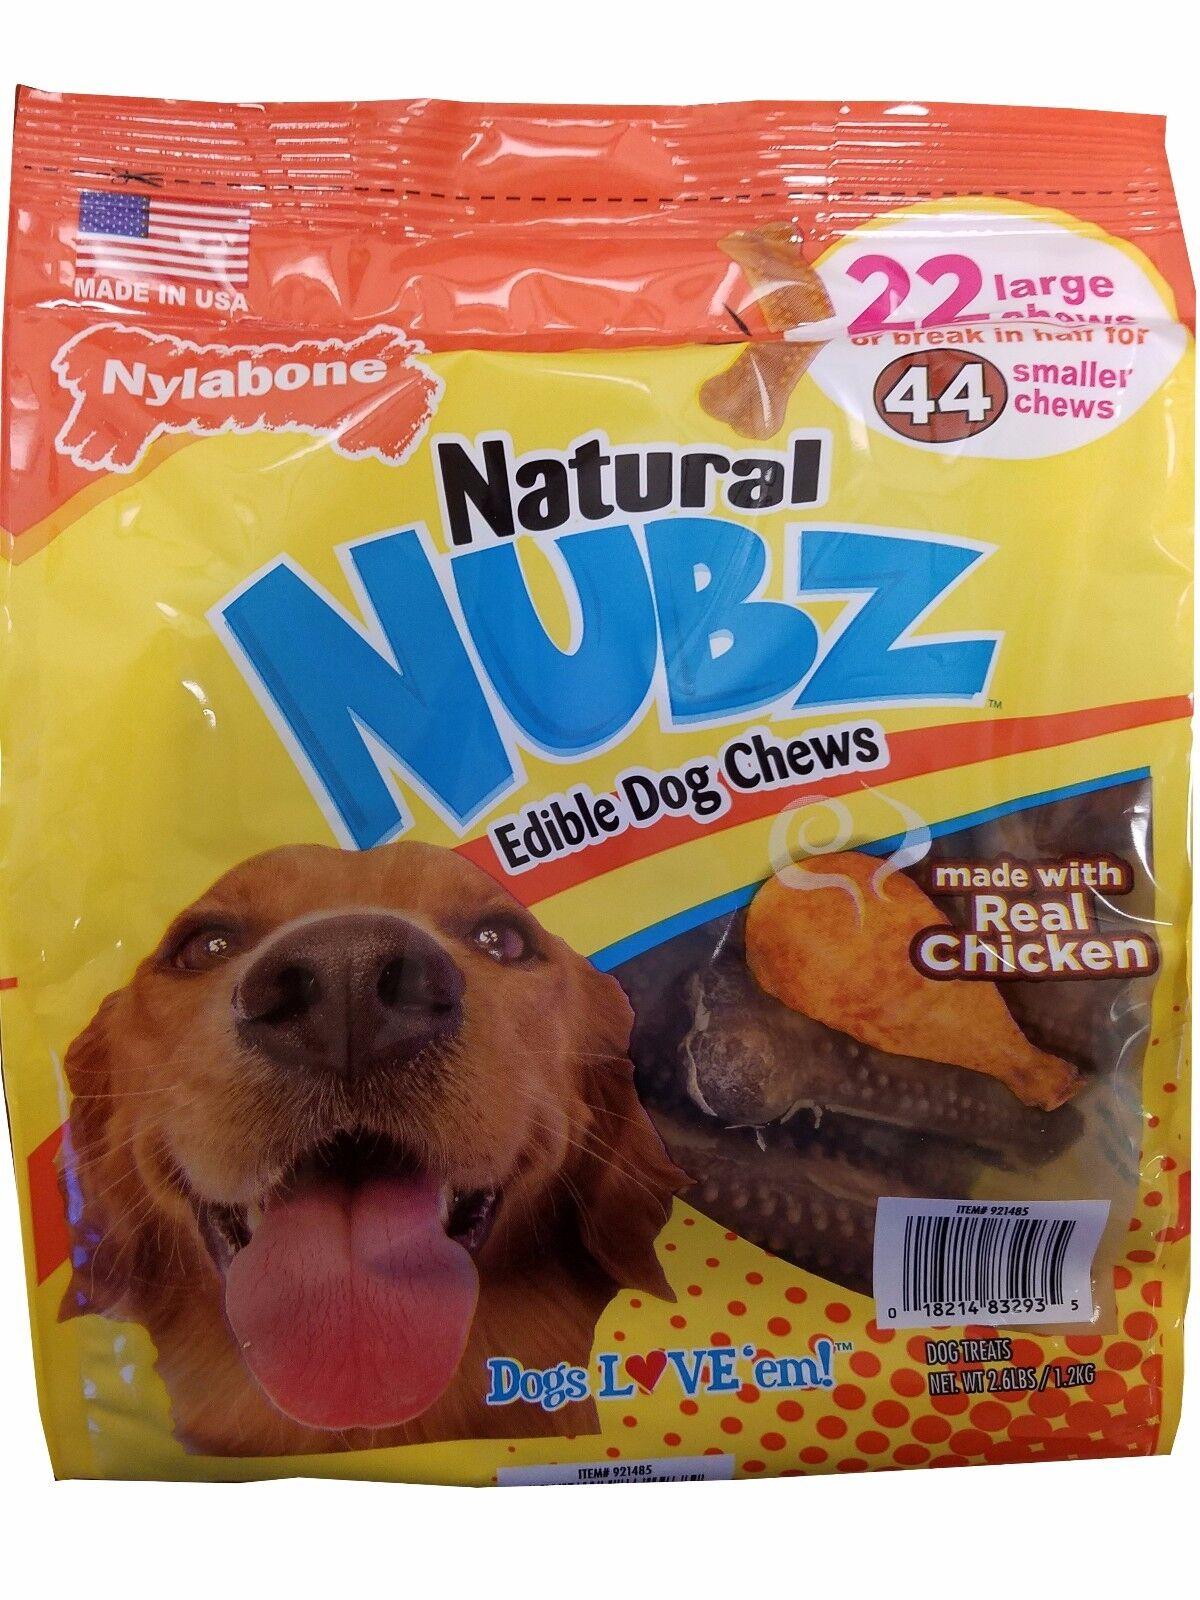 Nylabone Natural Nubz Edible Dog Chews 22ct.